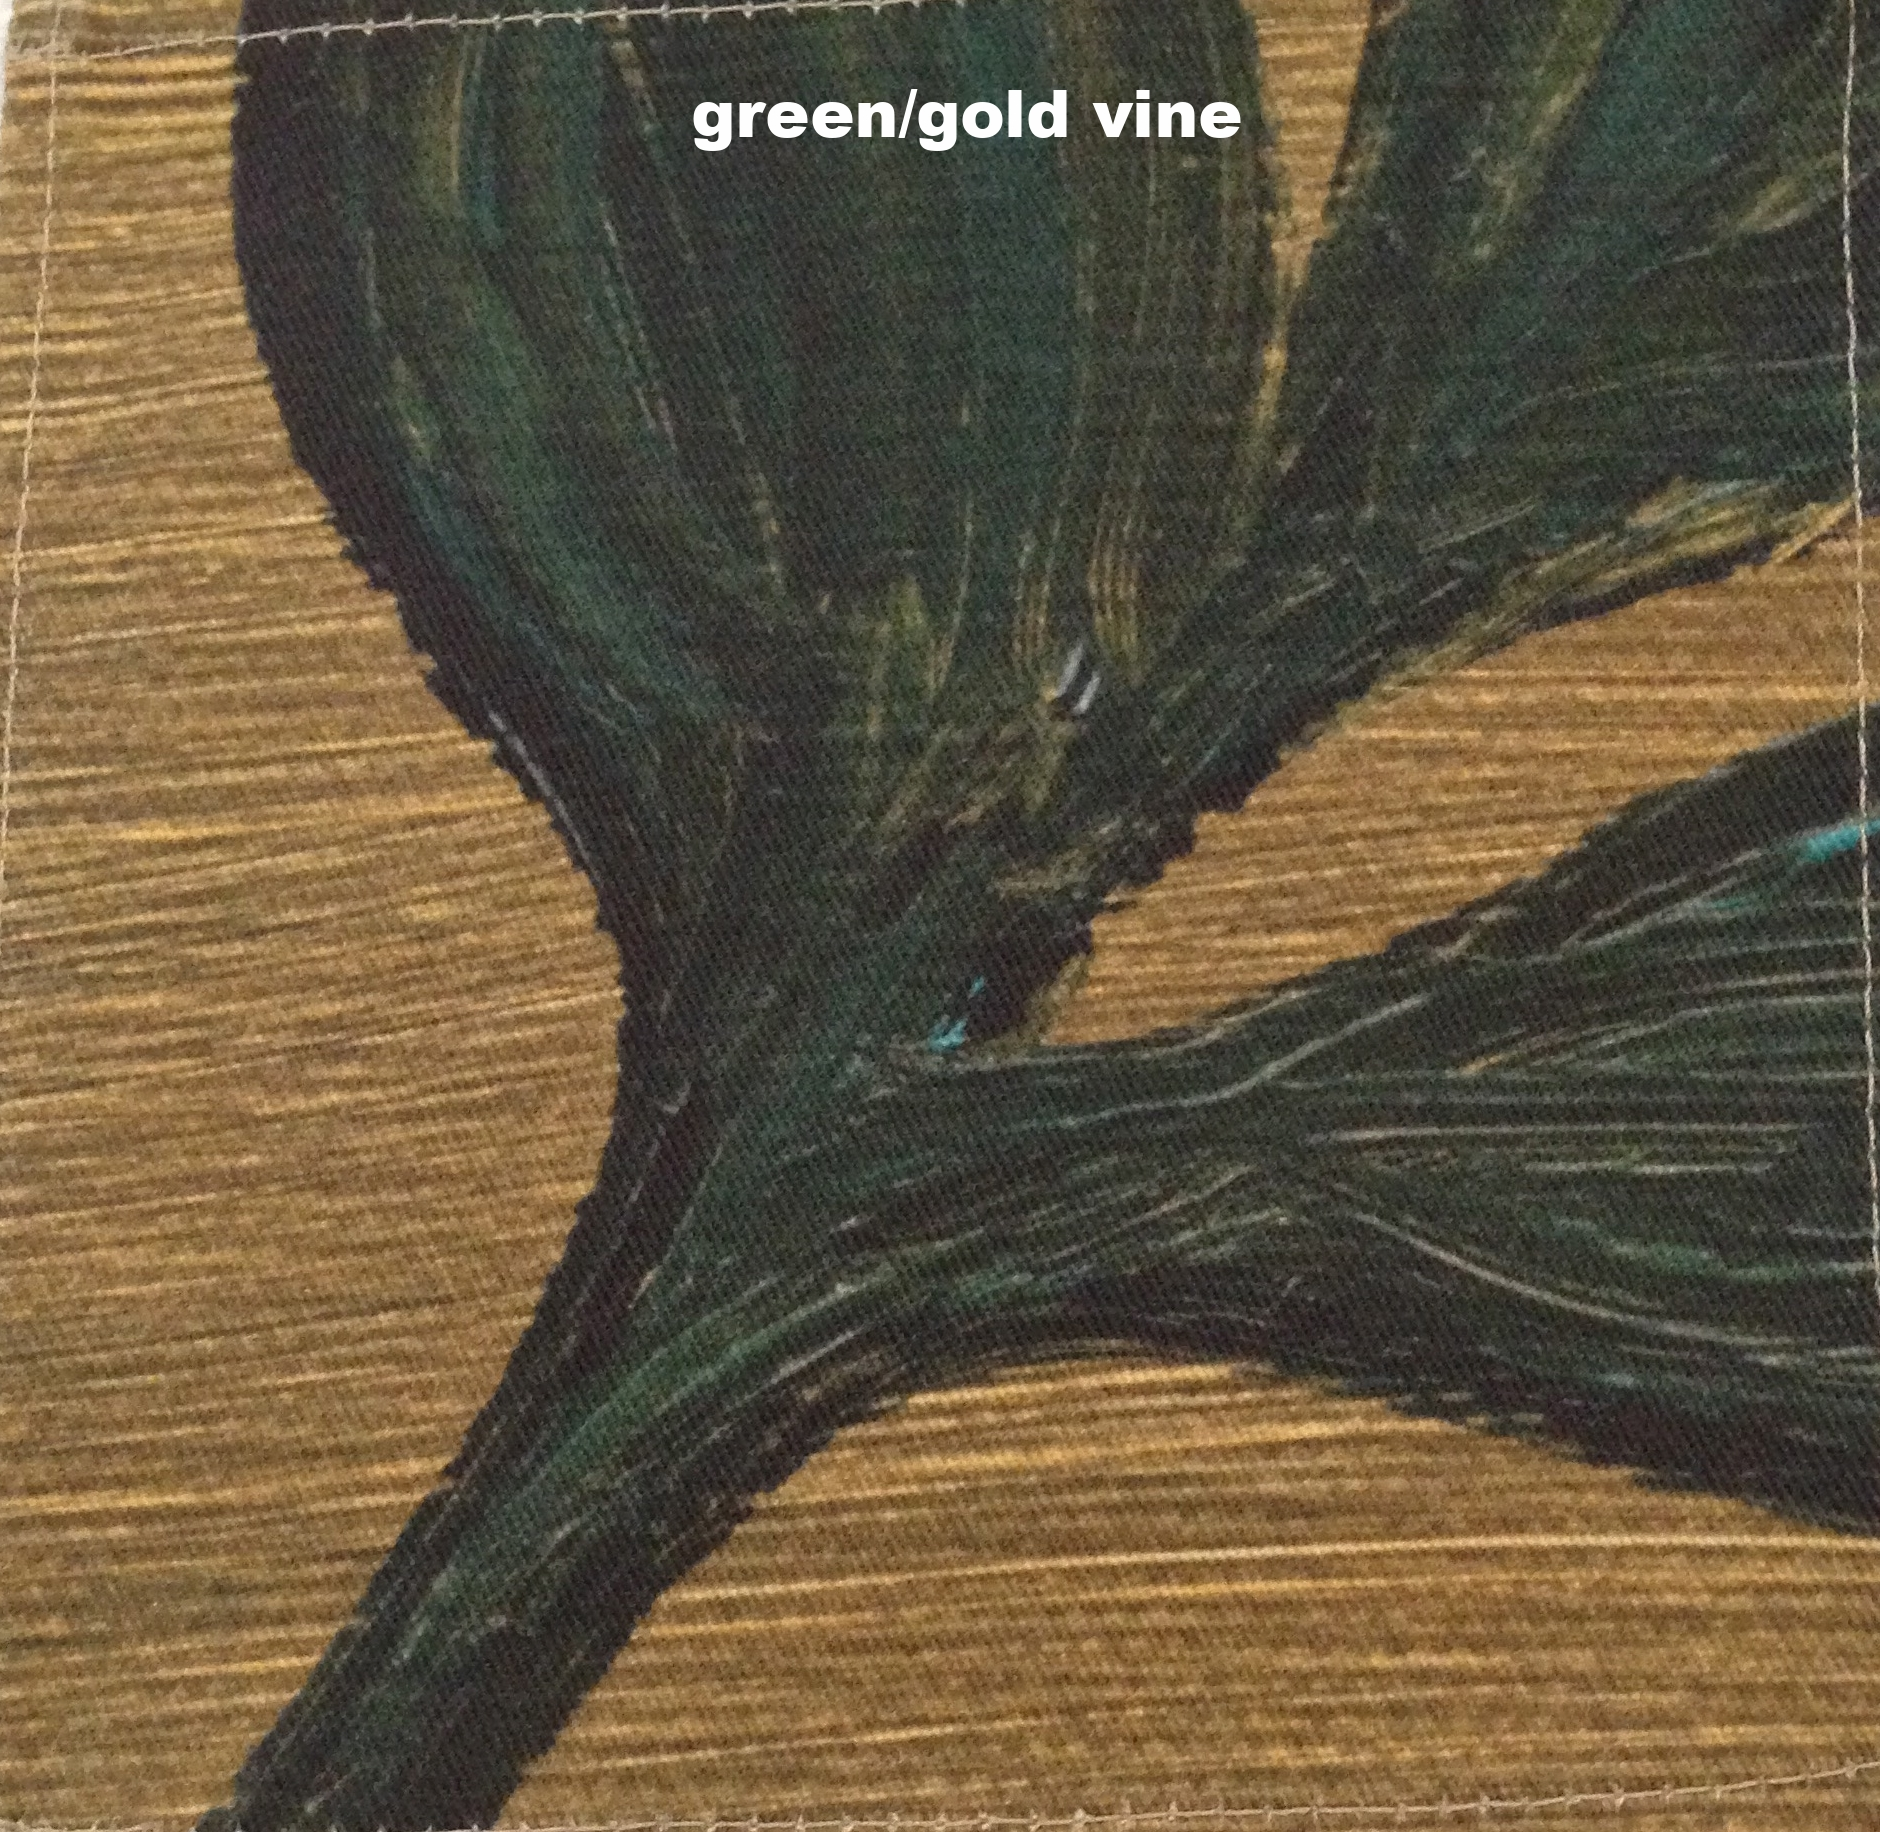 gold green vine